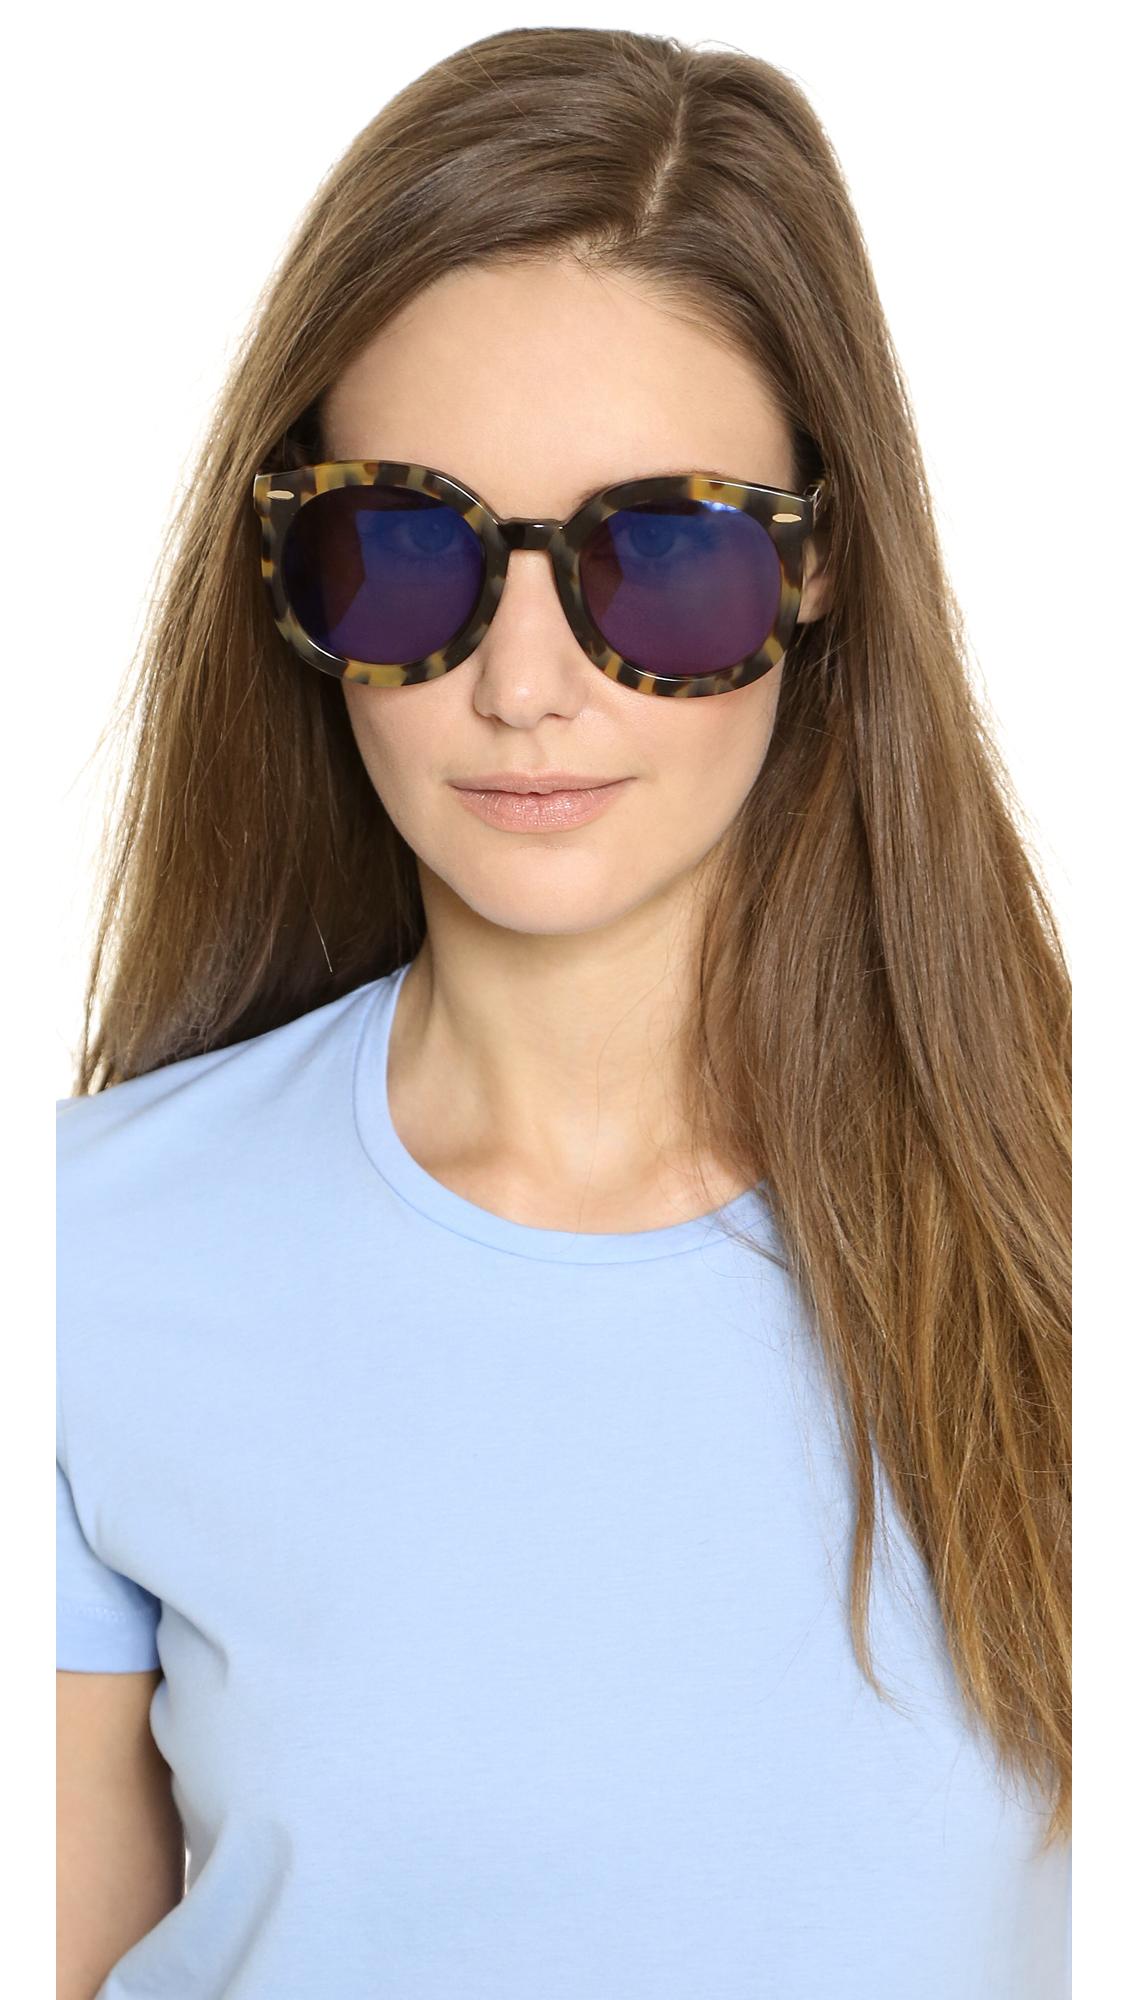 86532f18ebb Karen Walker Superstars Collection Super Duper Strength Mirrored Sunglasses